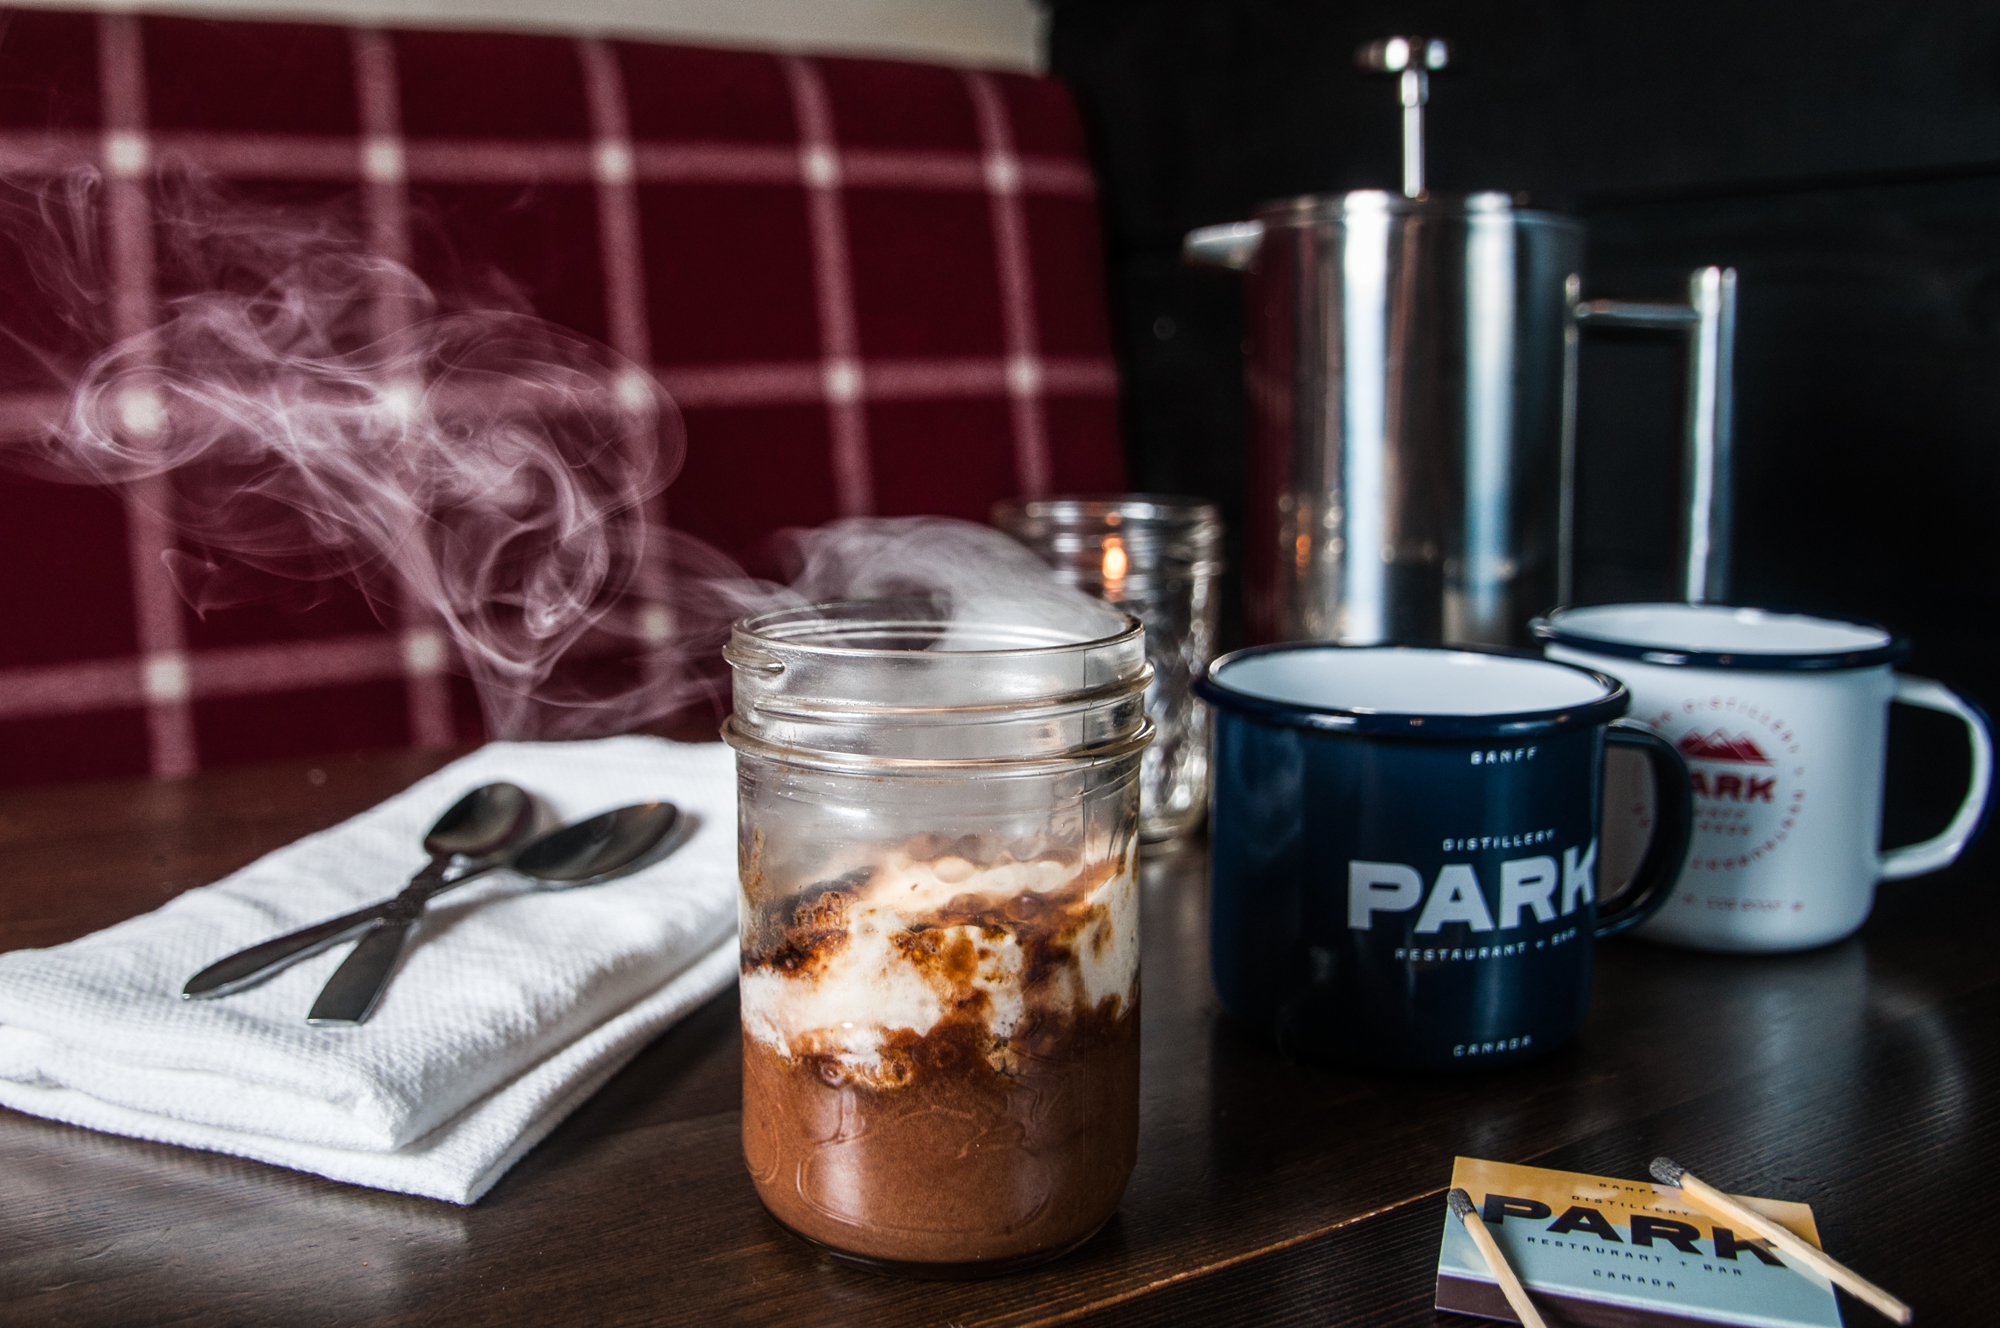 Park Distillery Restaurant & Bar s'more